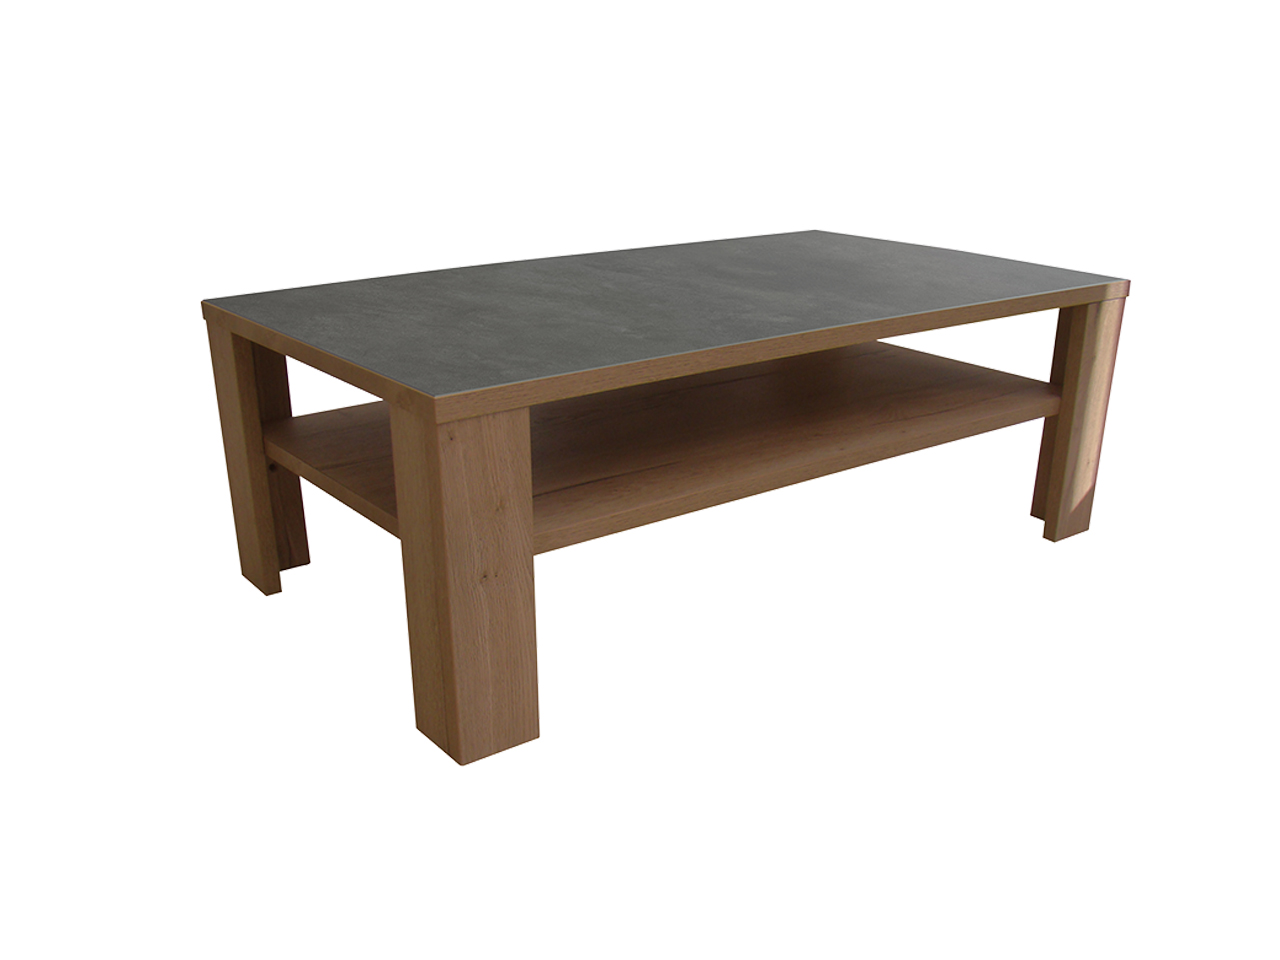 table basse himalaya pieds bois ch ne tabac ceram gris meubles minet. Black Bedroom Furniture Sets. Home Design Ideas